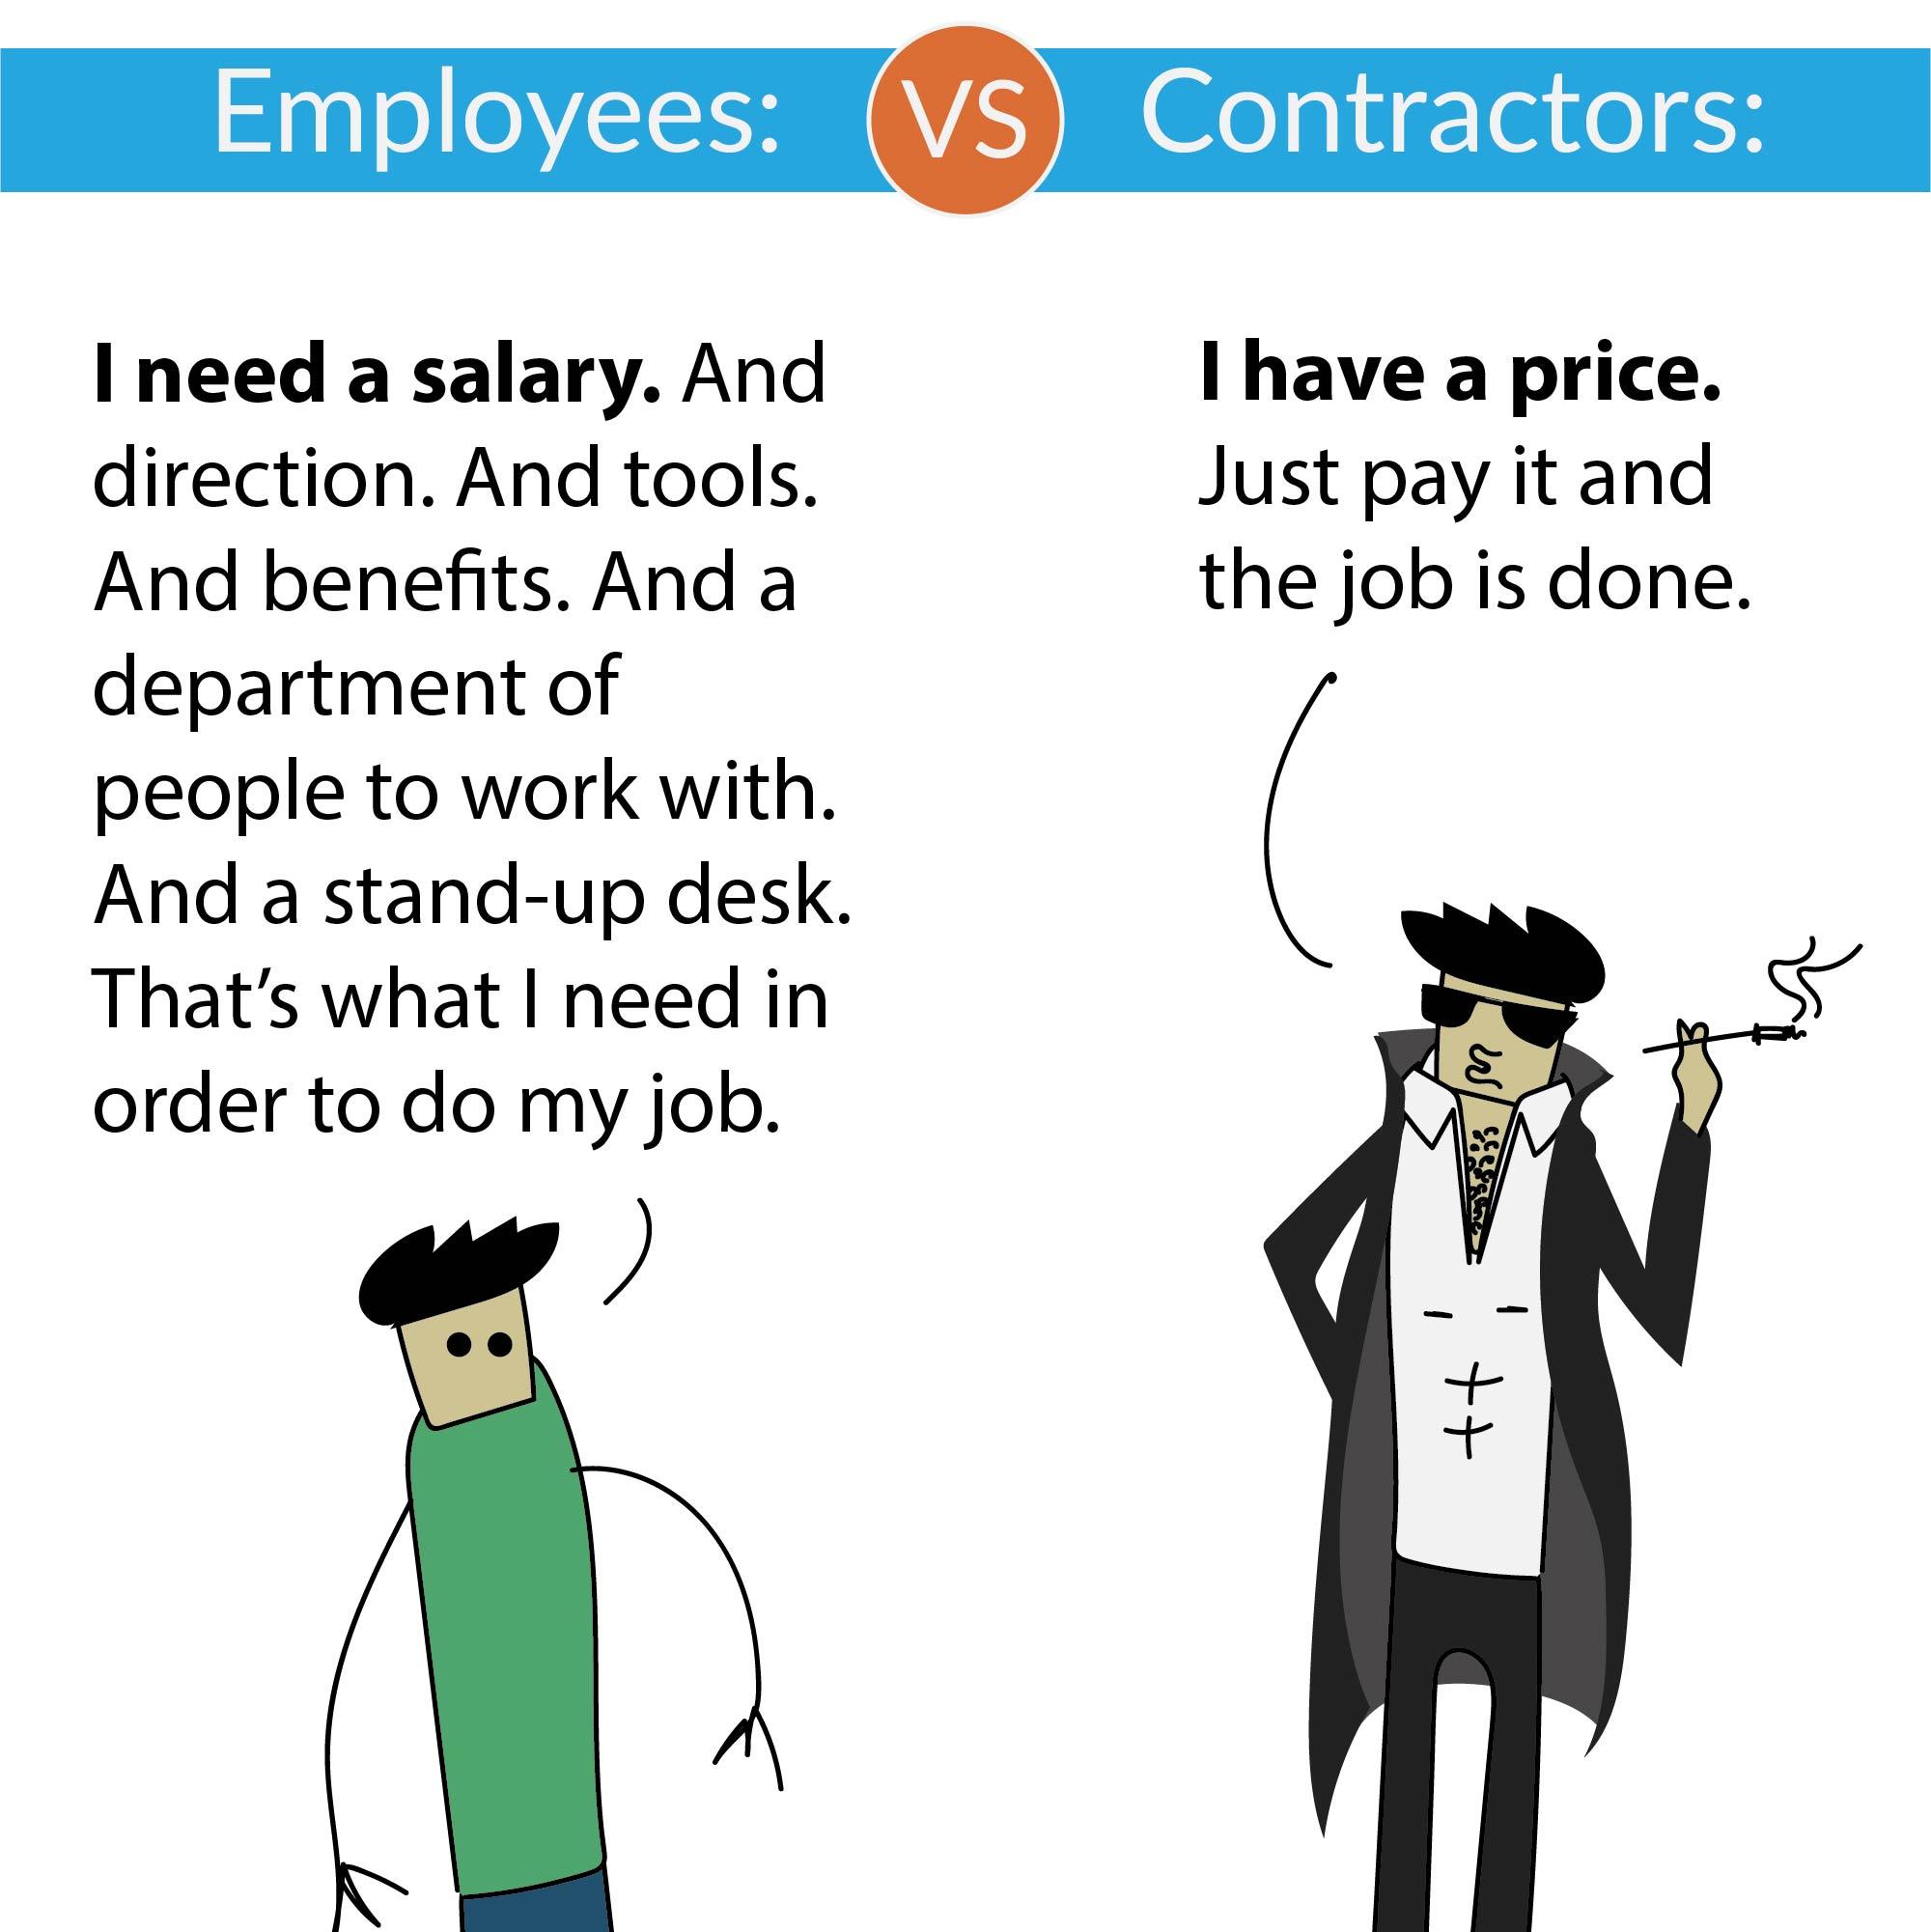 employe-vs-contractor-needs